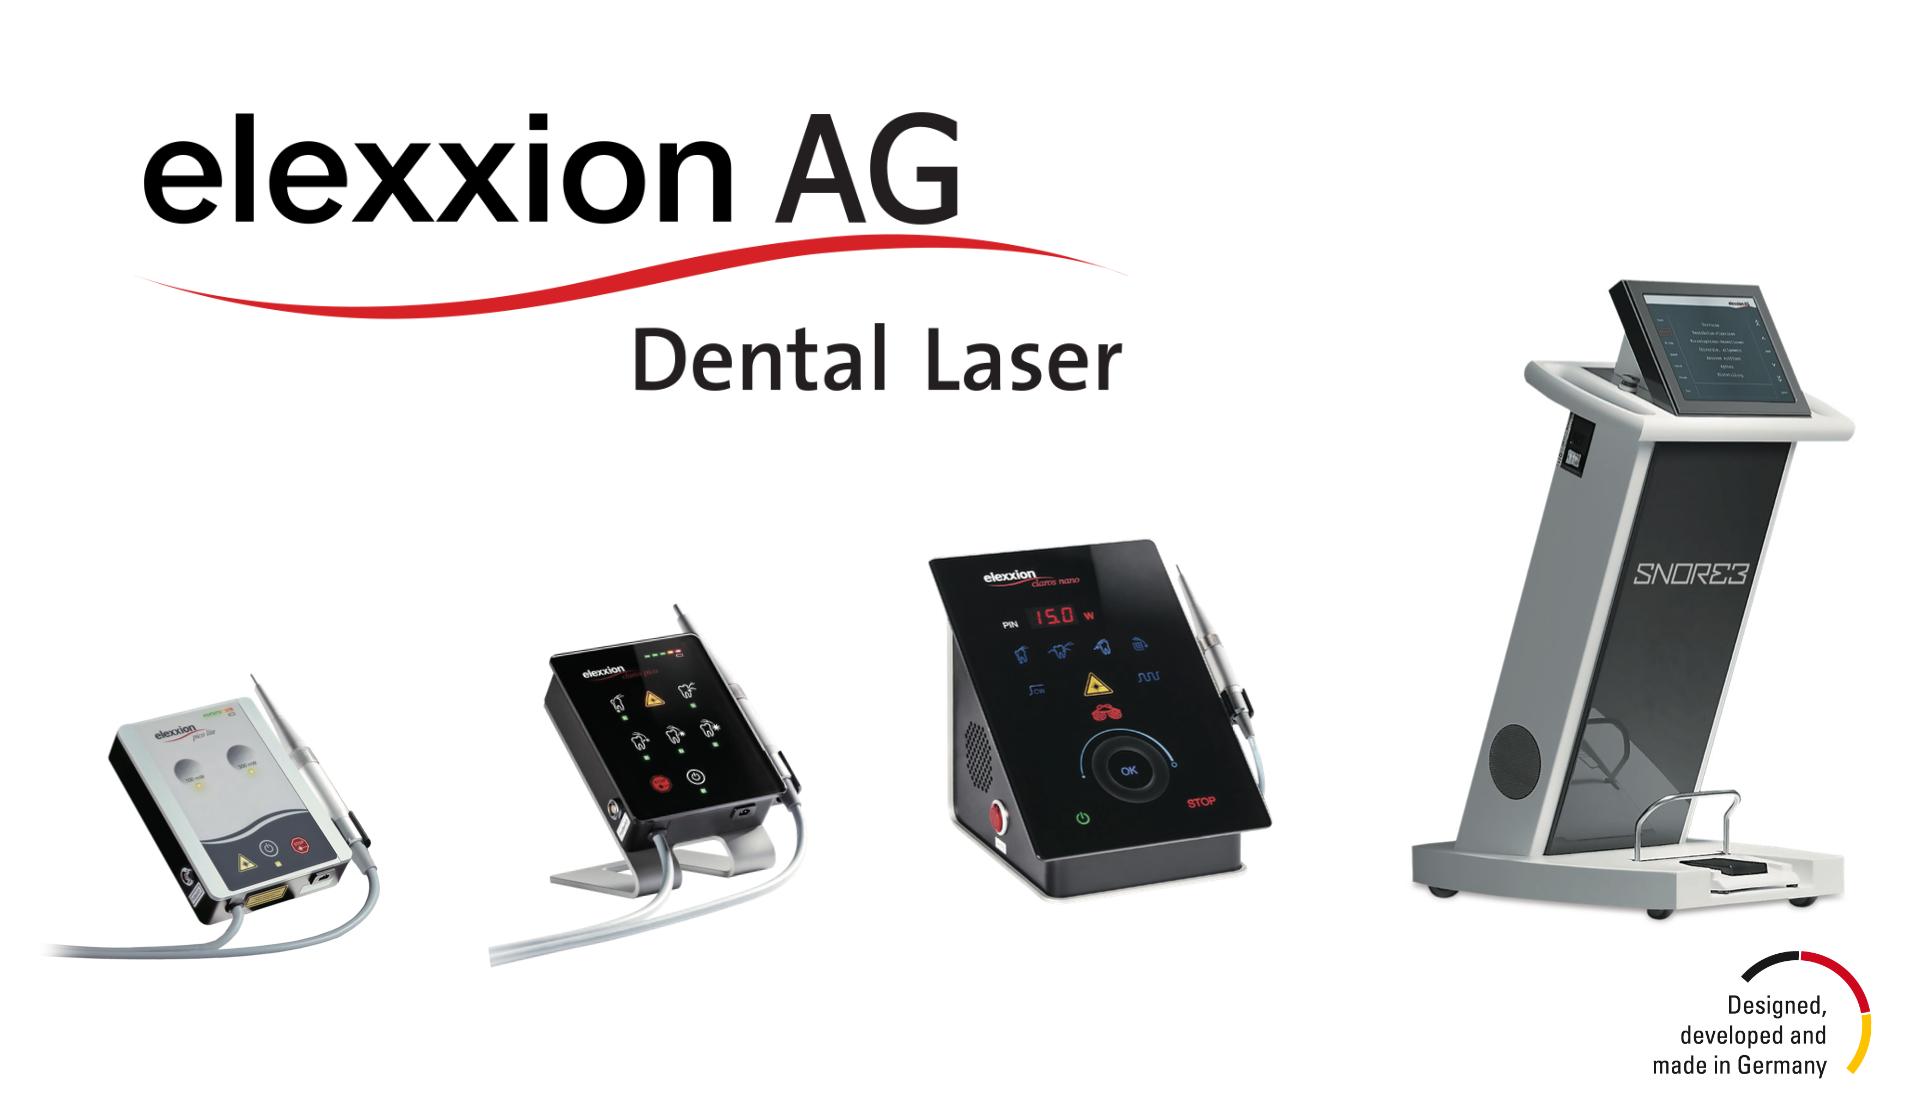 Elexxion Dental Lasers